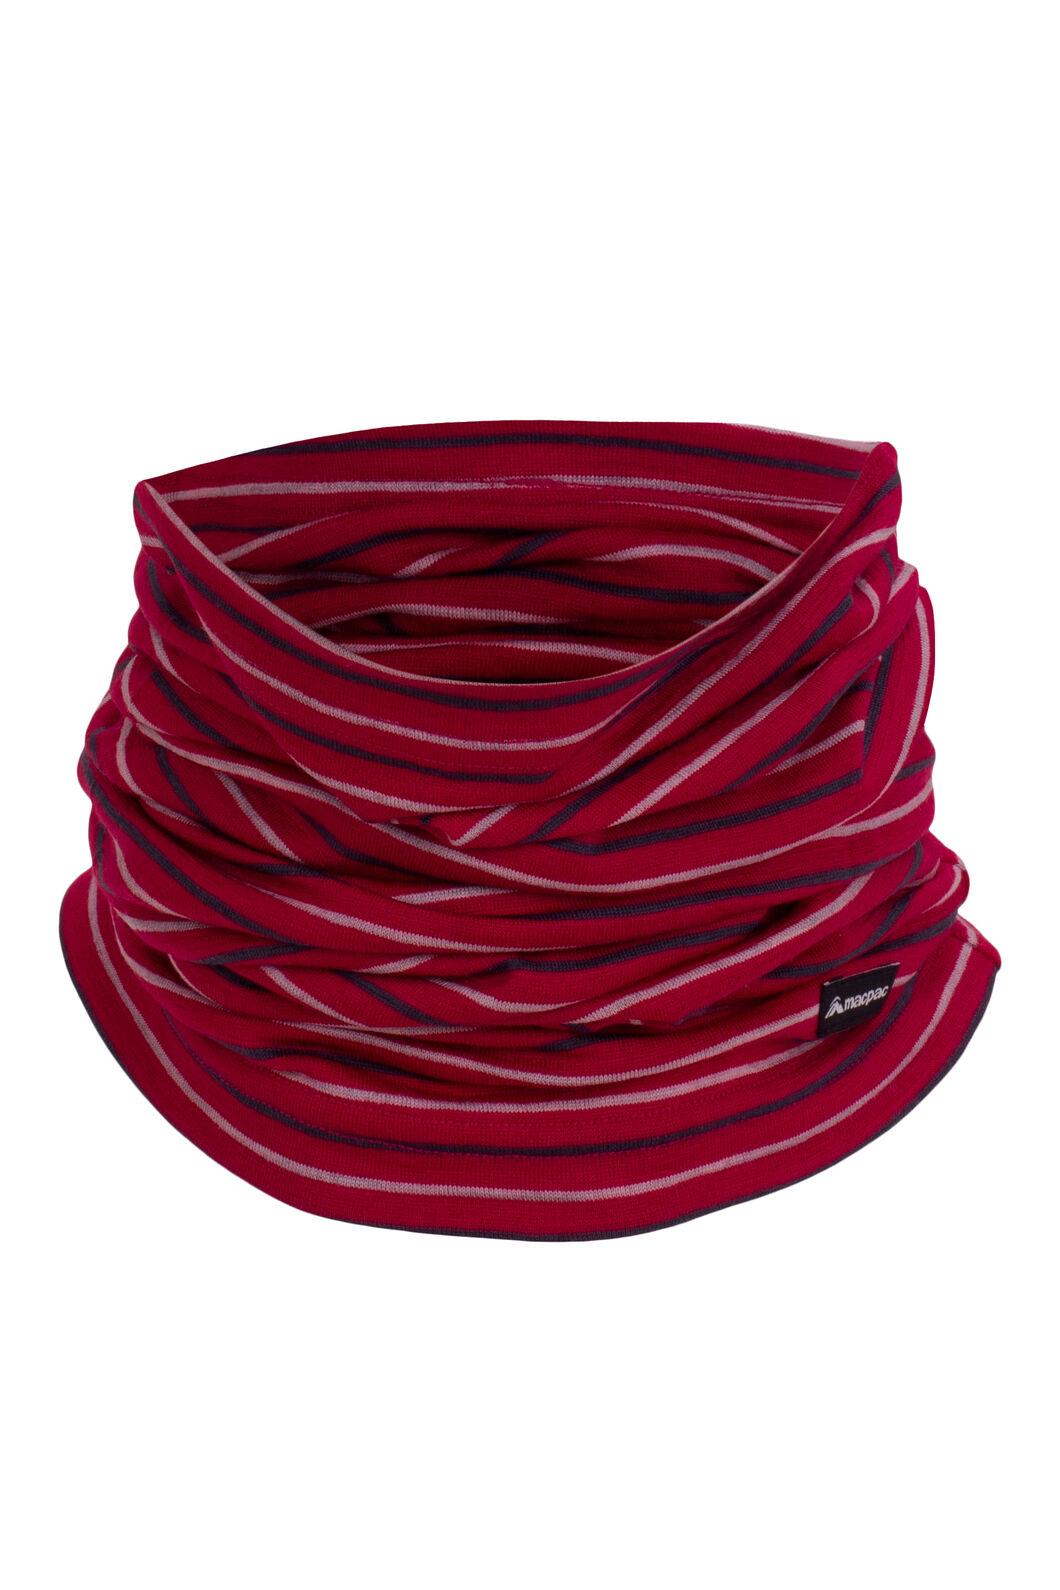 Macpac Merino 150 Neck Gaiter, Persian Red Stripe, hi-res